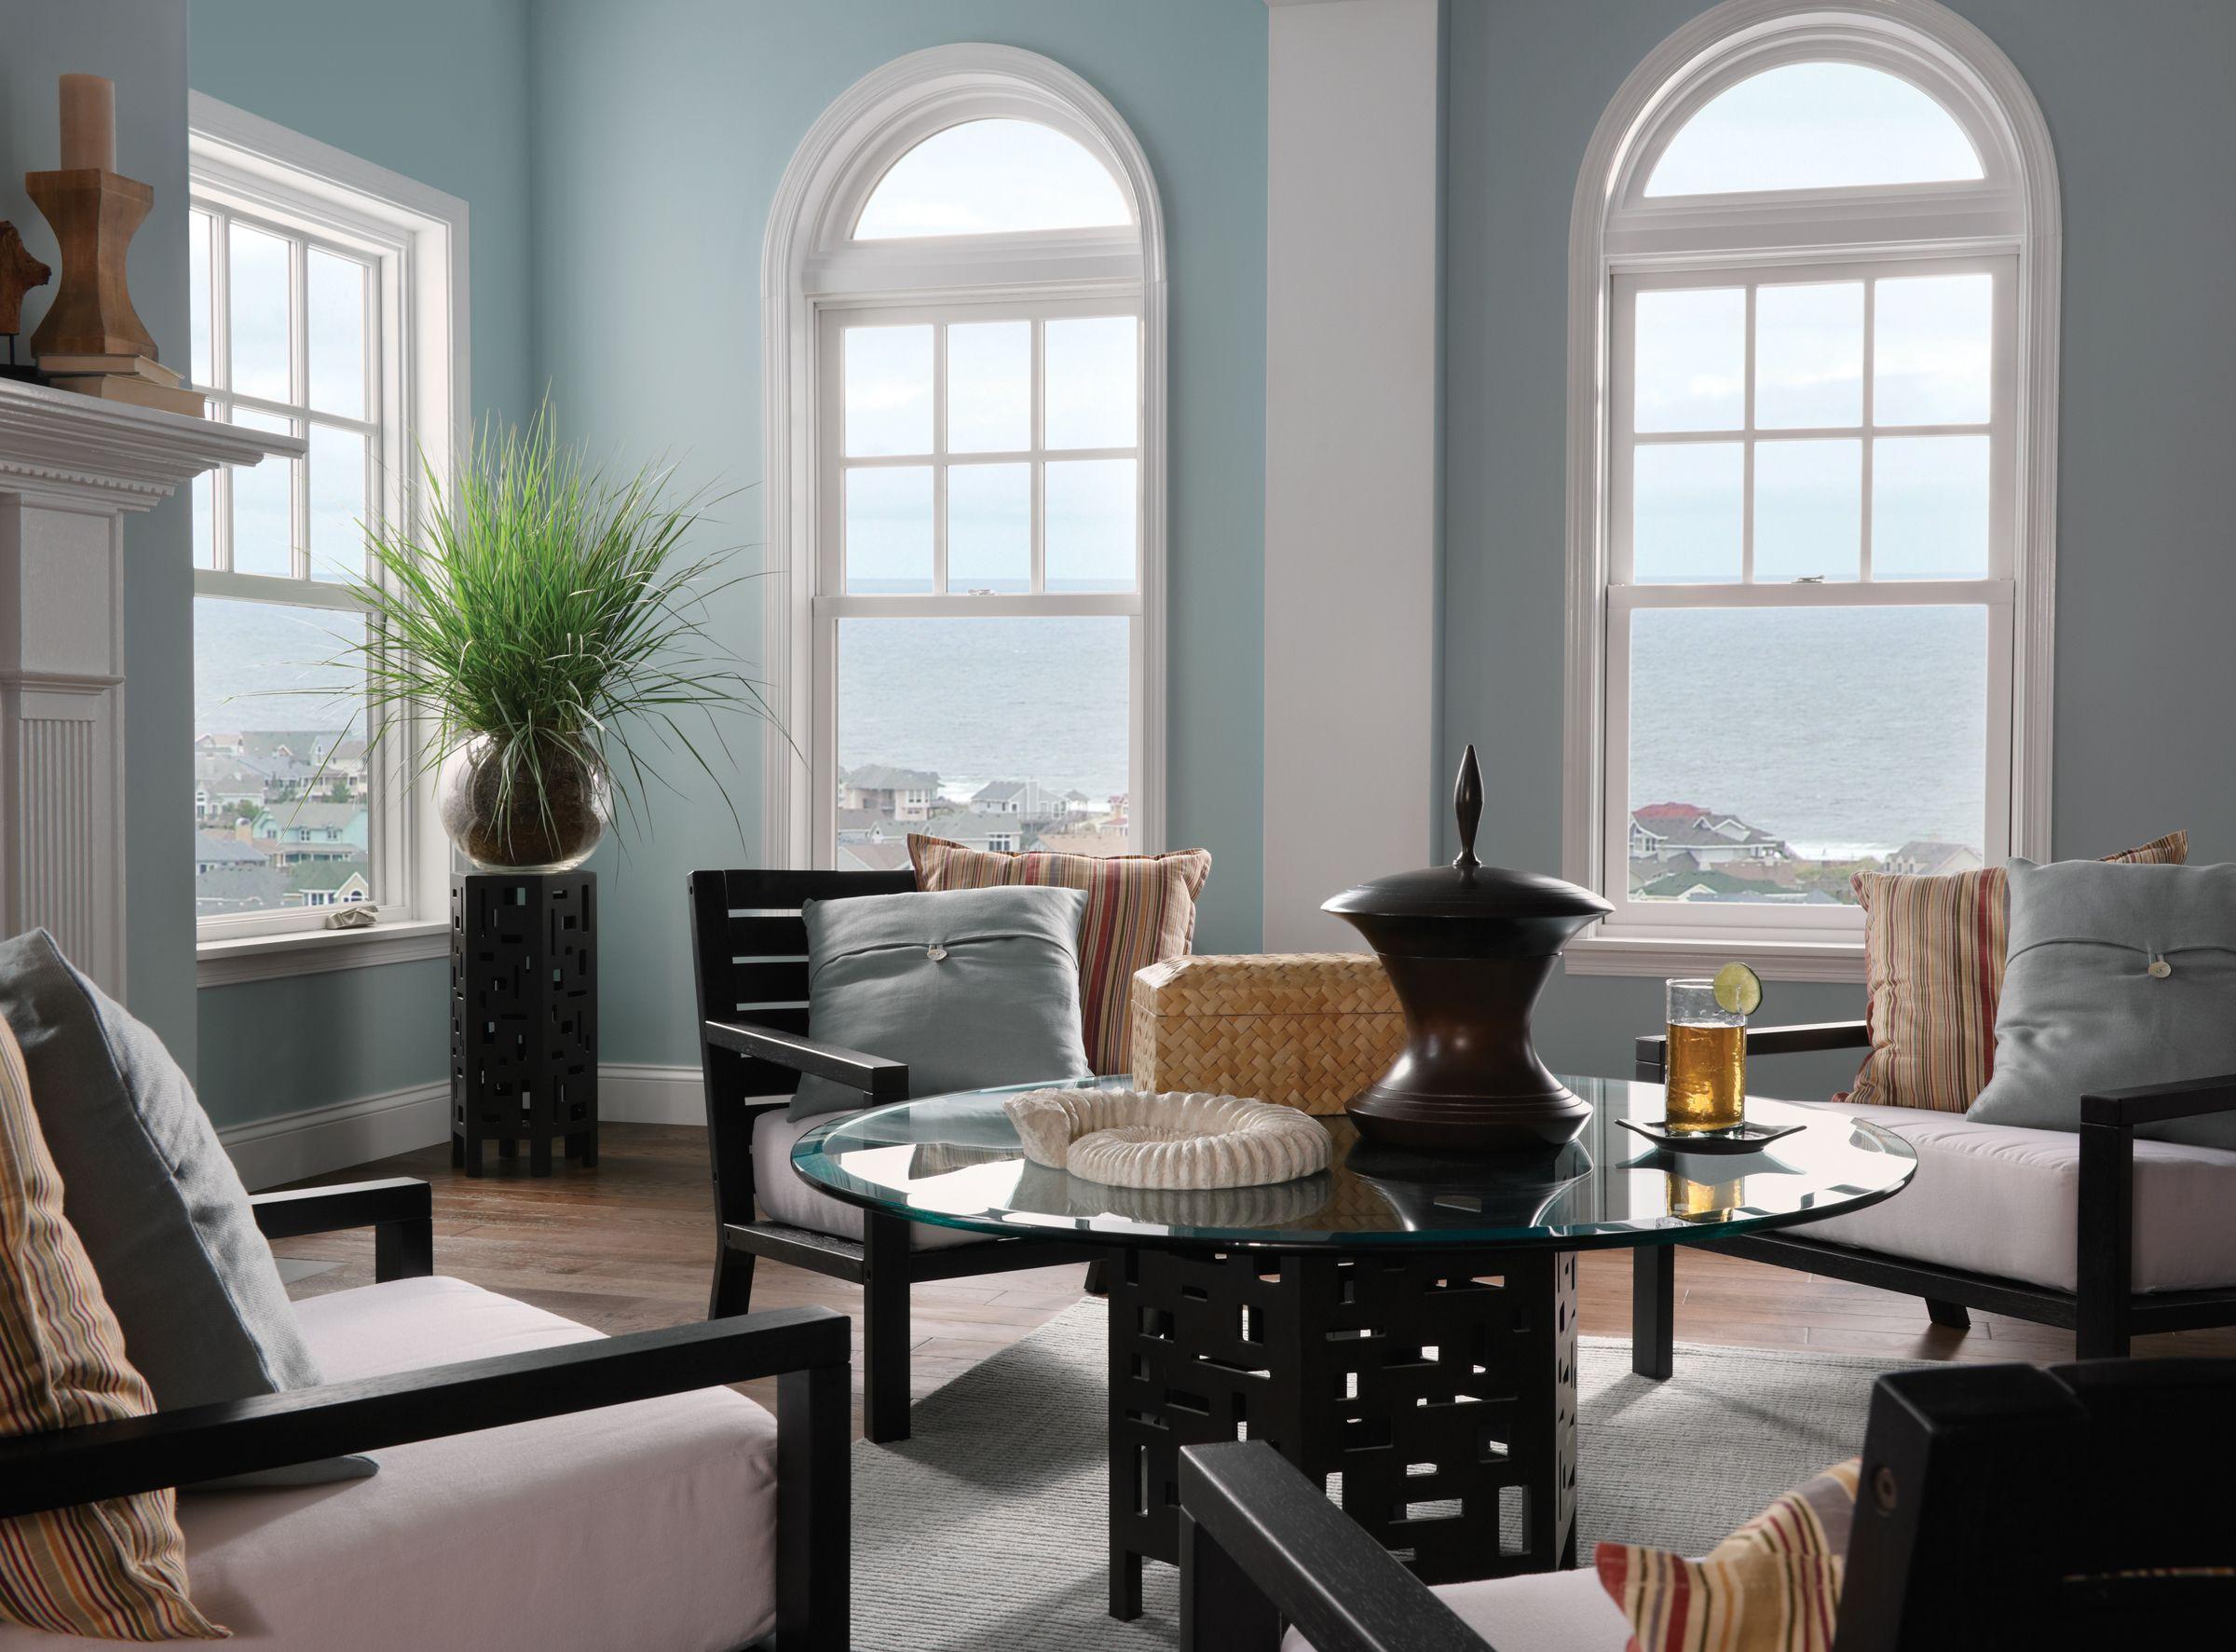 Milgard Essence Windows  Beautiful Windows & Doors  Pinterest Amazing Living Room Window Design Ideas Design Decoration